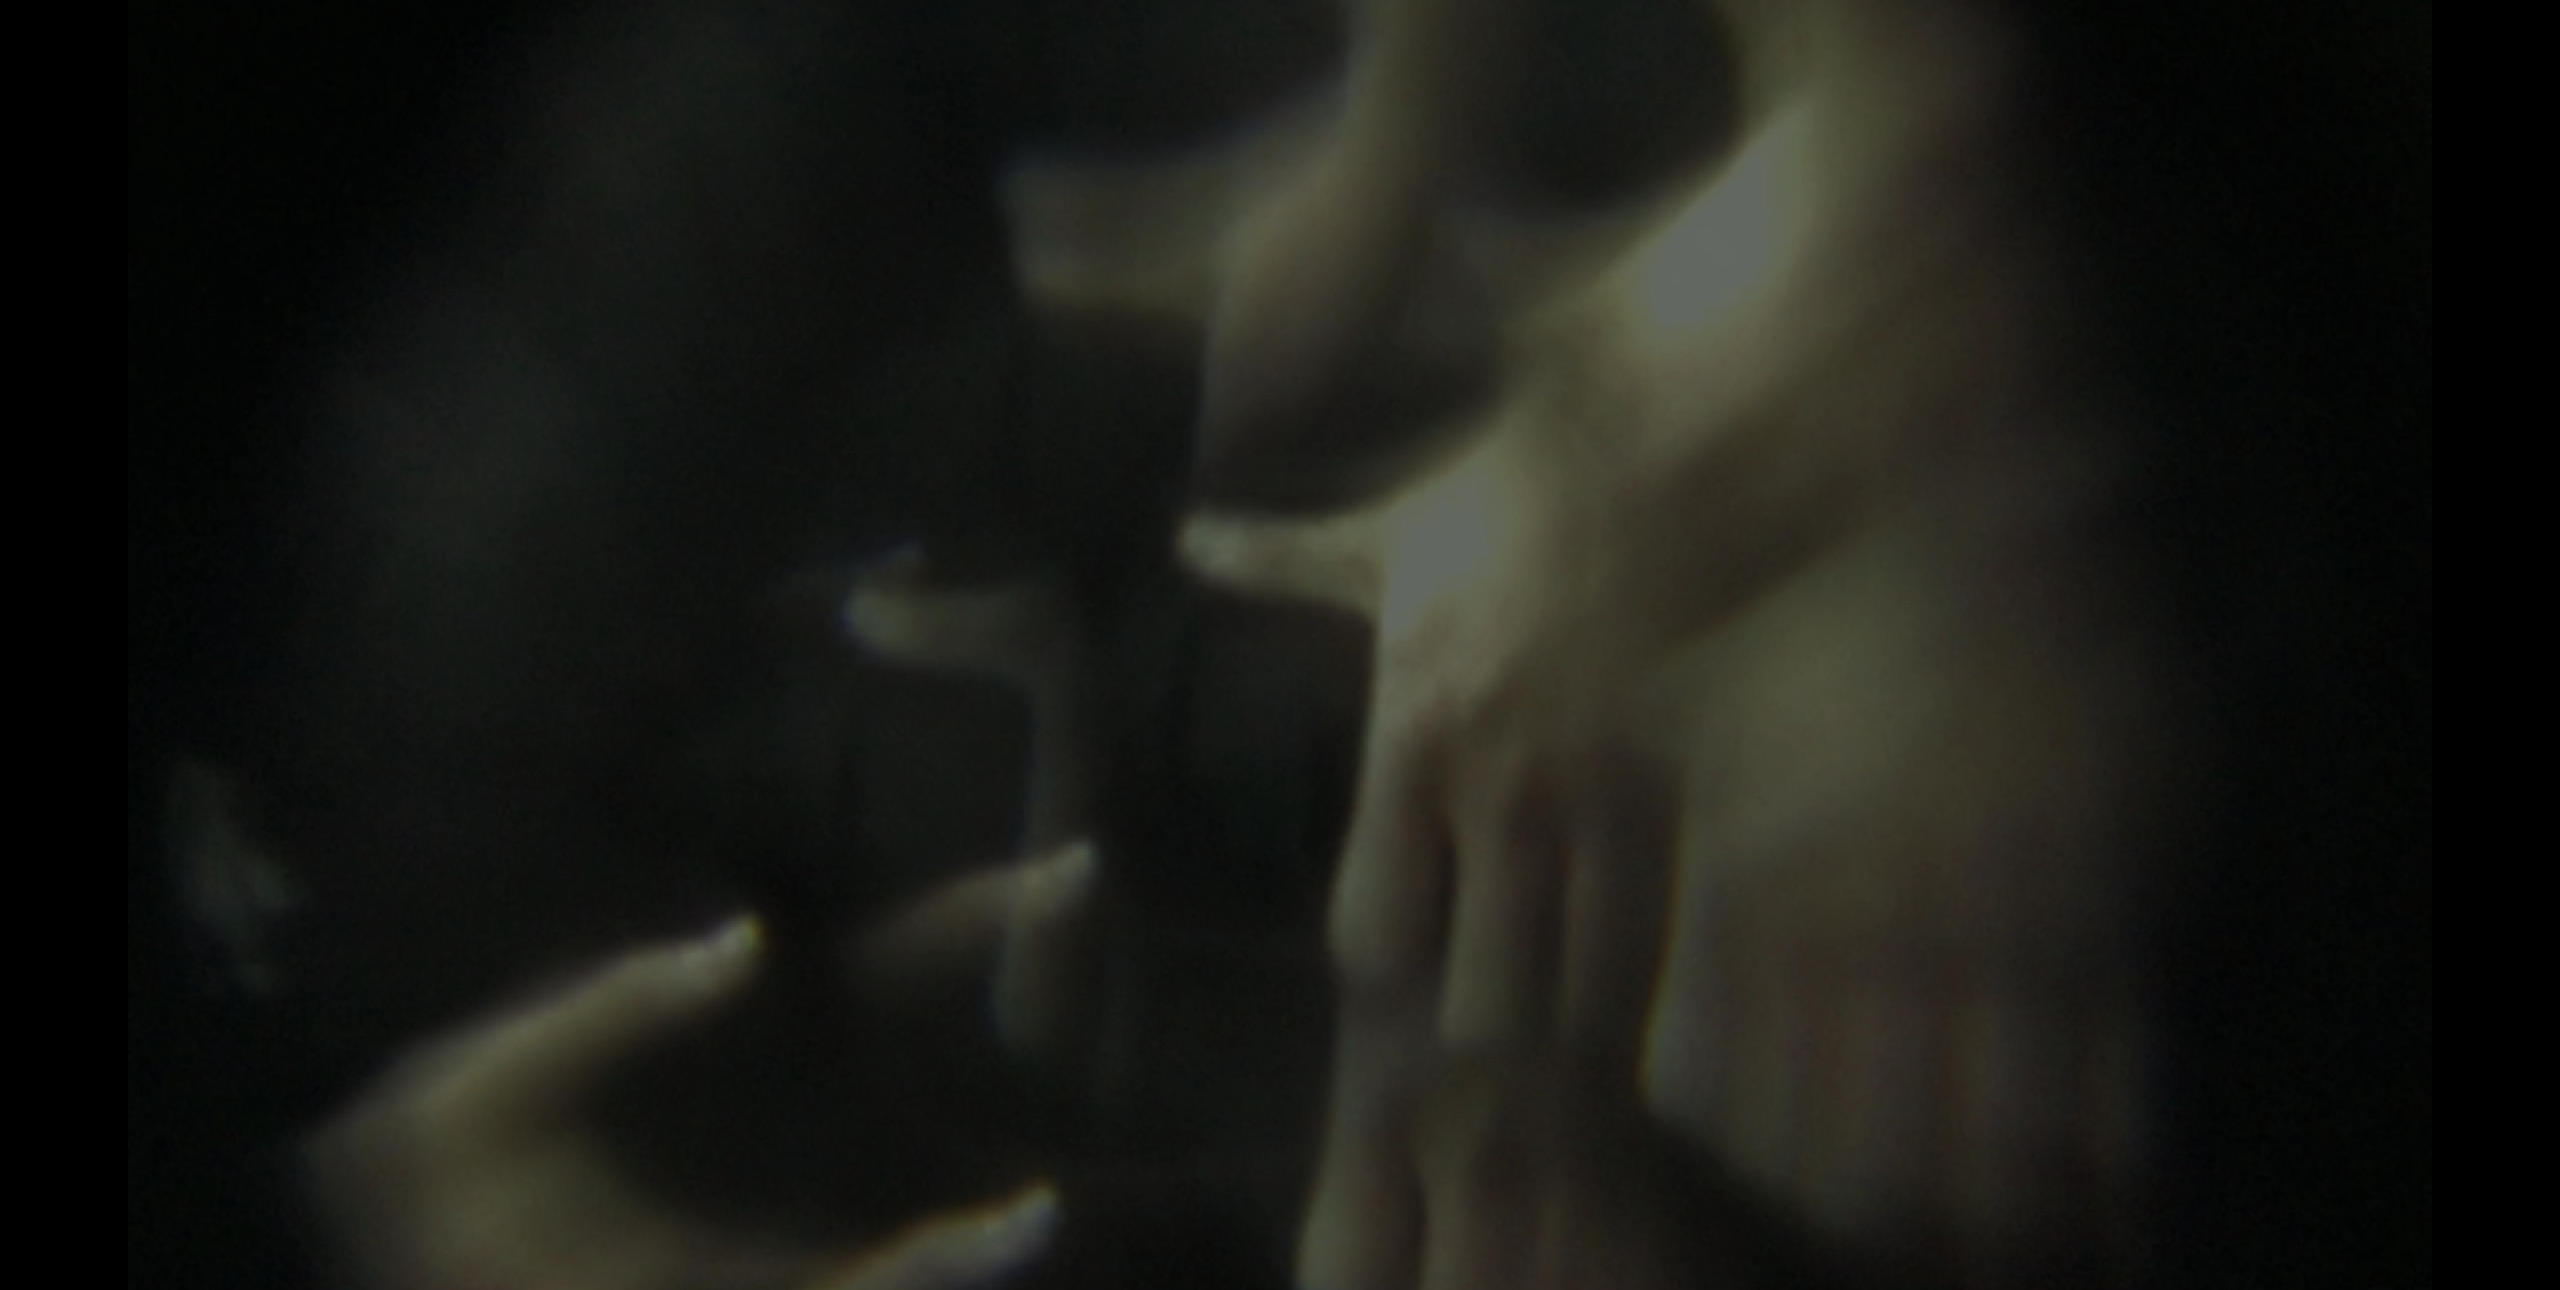 Terre Thaemlitz, Video still from Deproduction, 2017, (Comatonse Recordings).